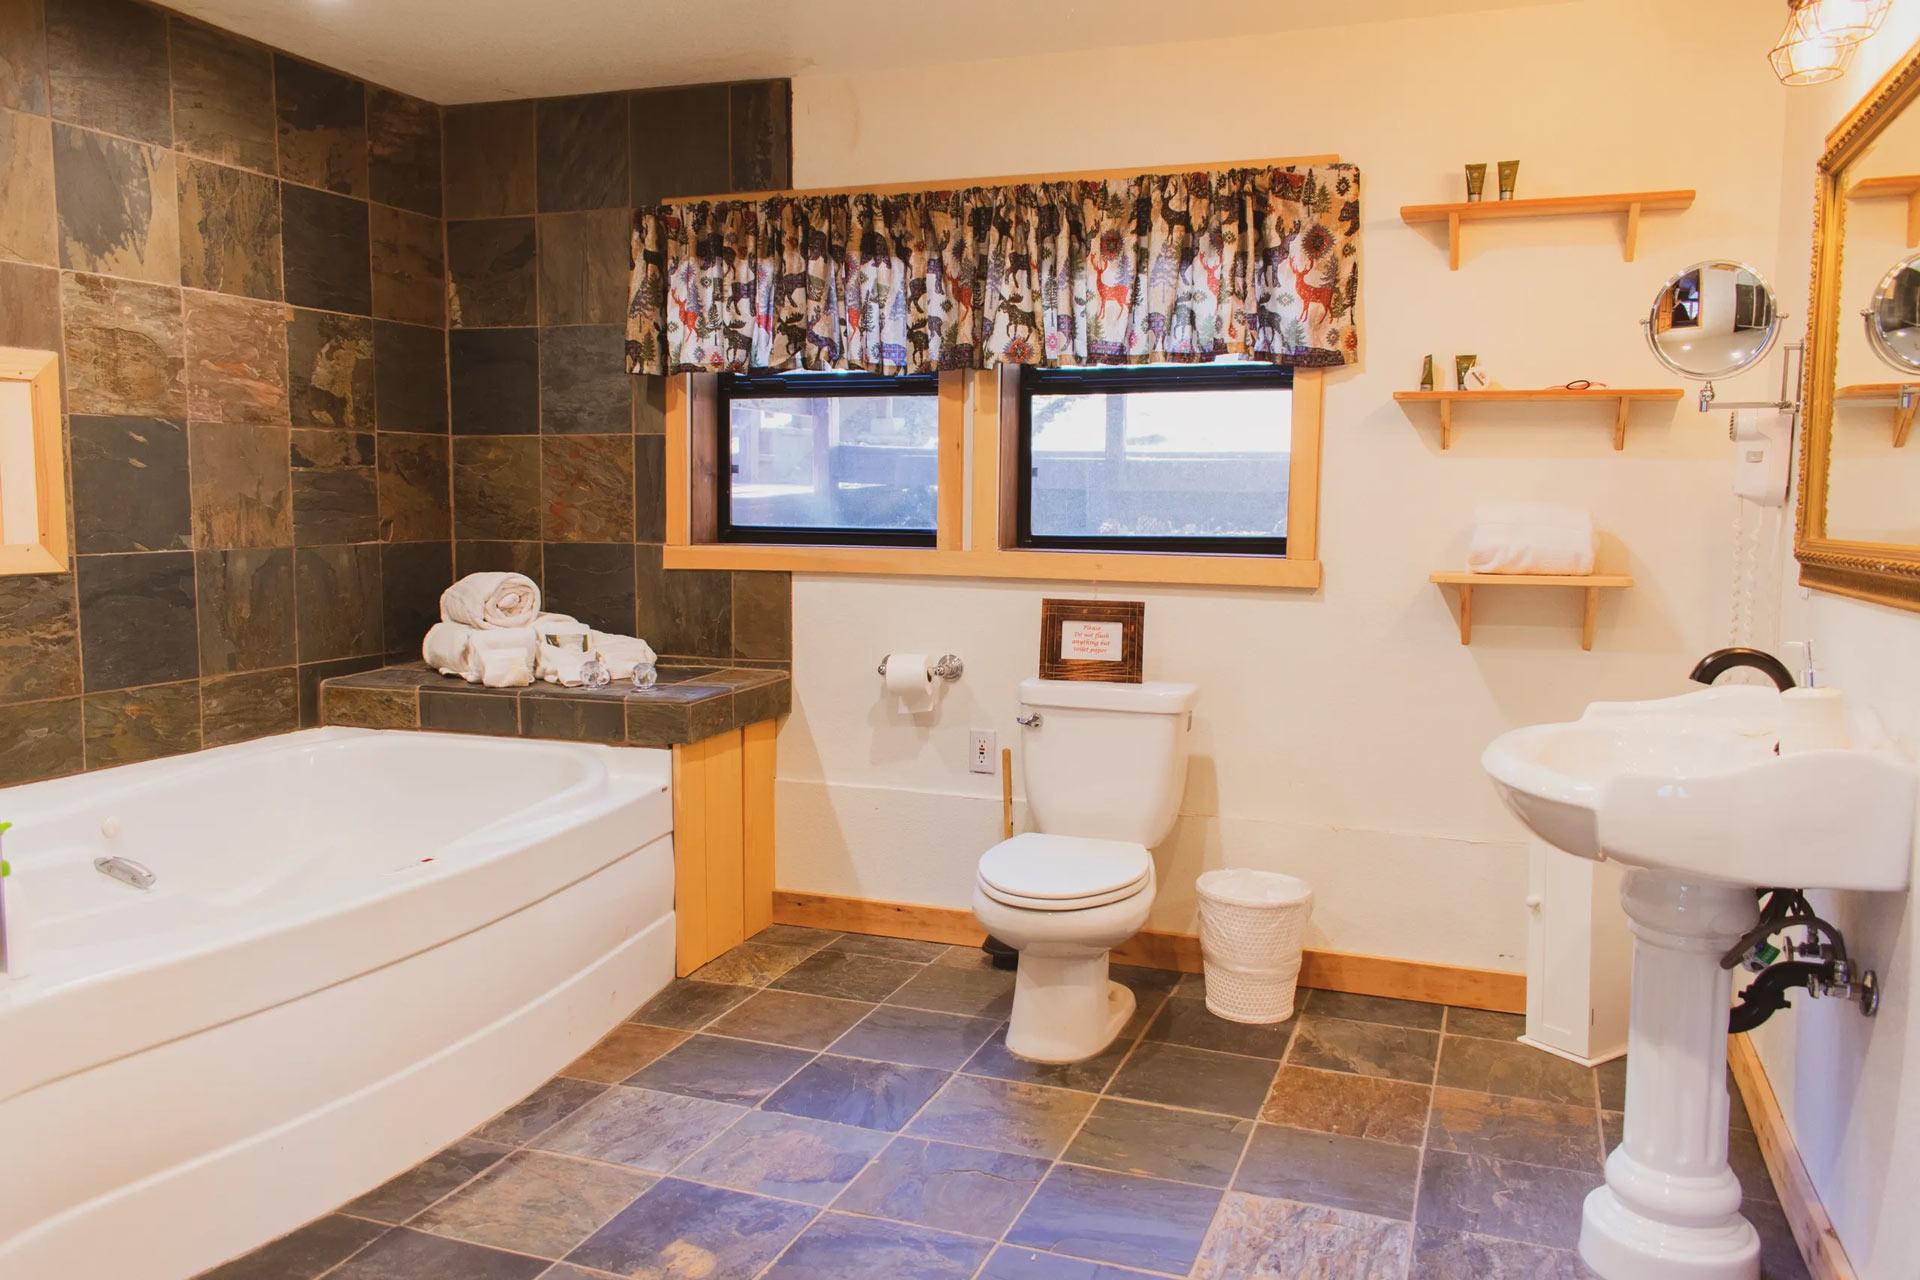 Carriage house master bathroom